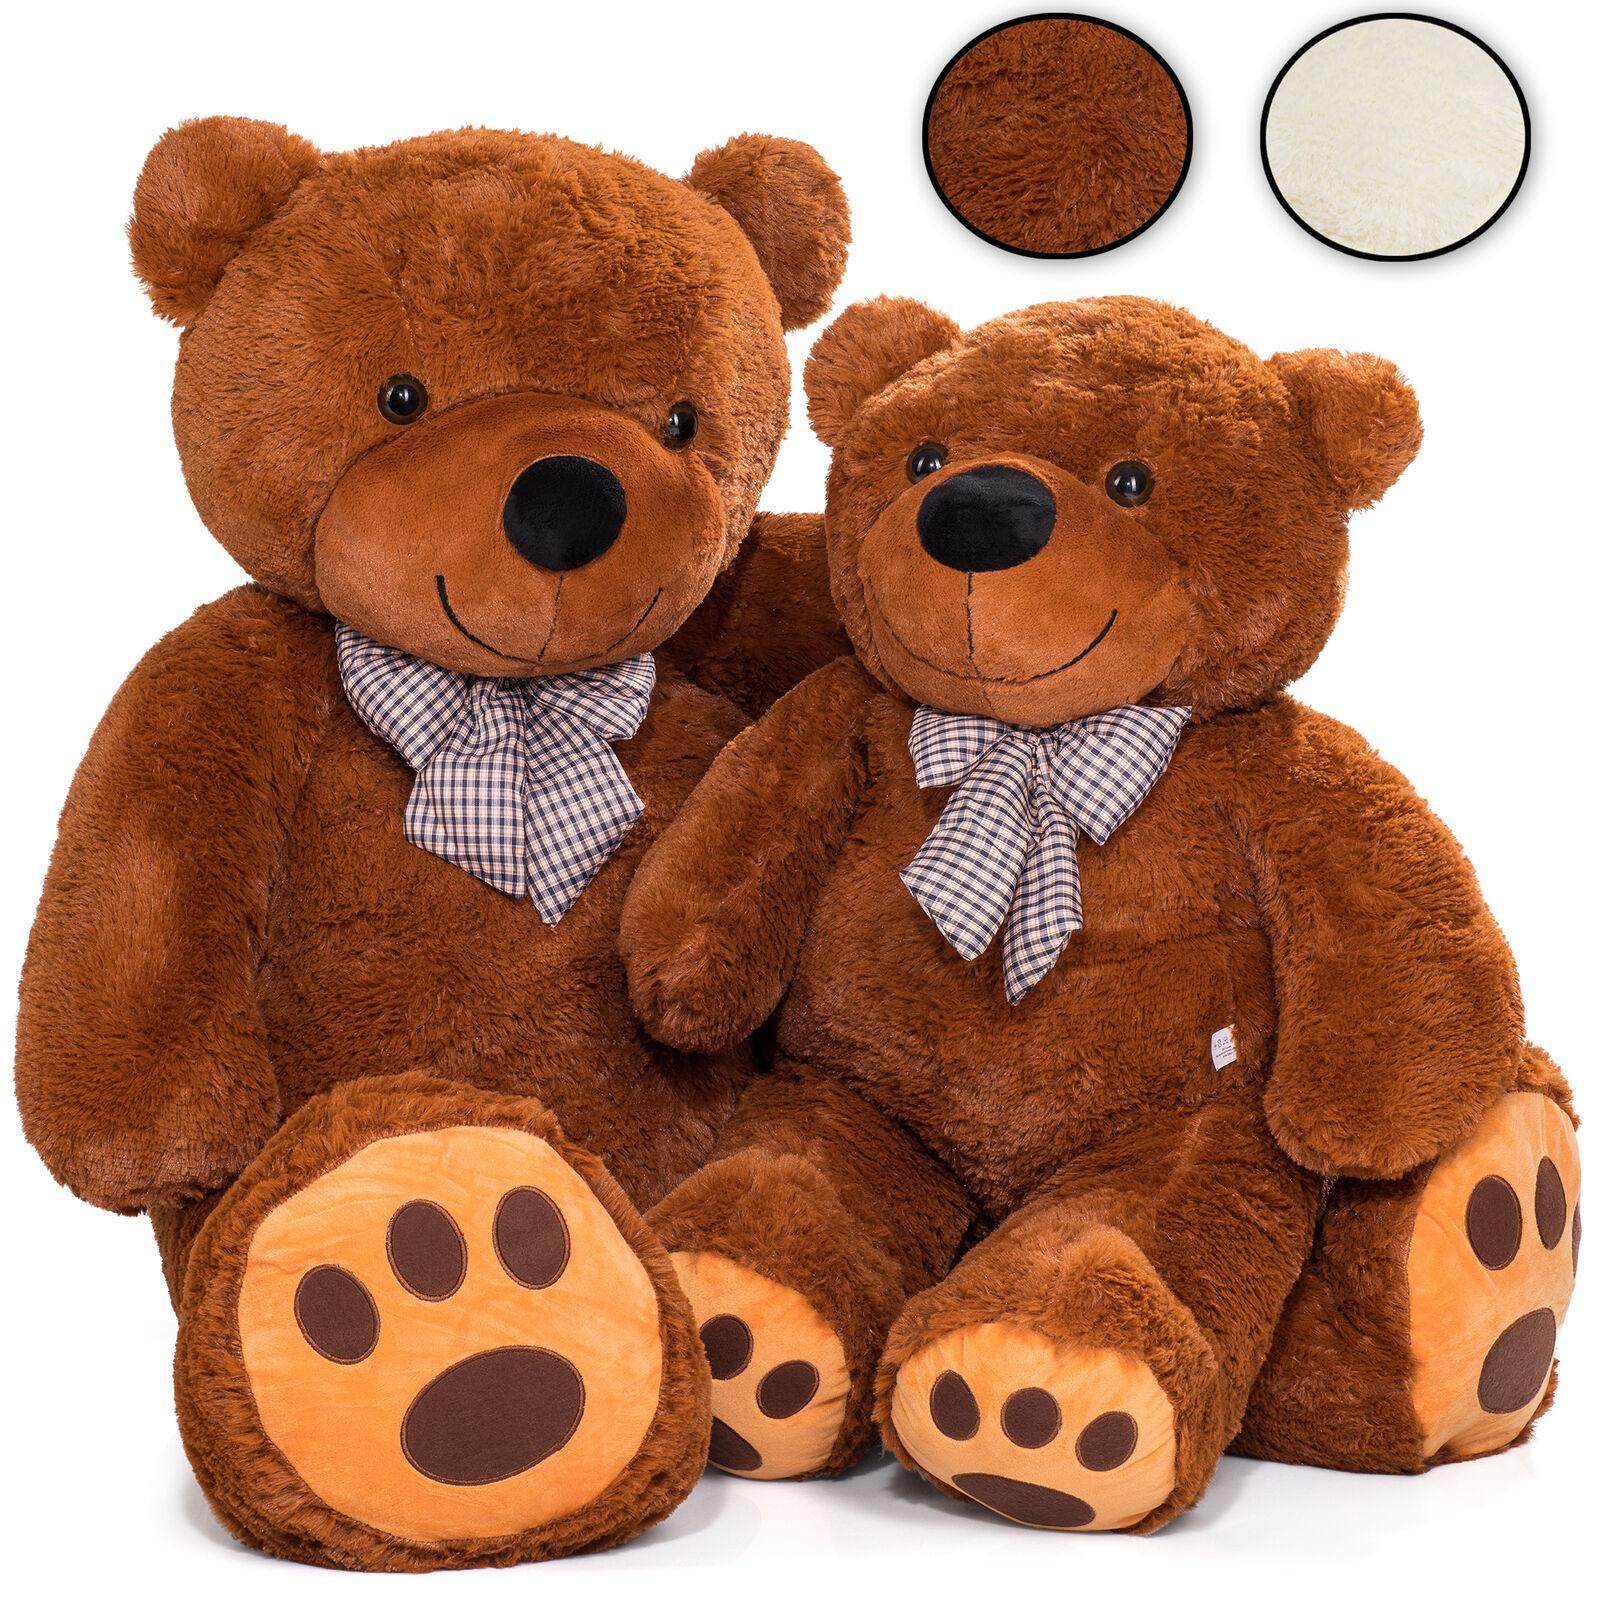 Teddy Bear XXL Soft Plush Large Giant Bear Big Soft Plush Toy 100 120 140 170